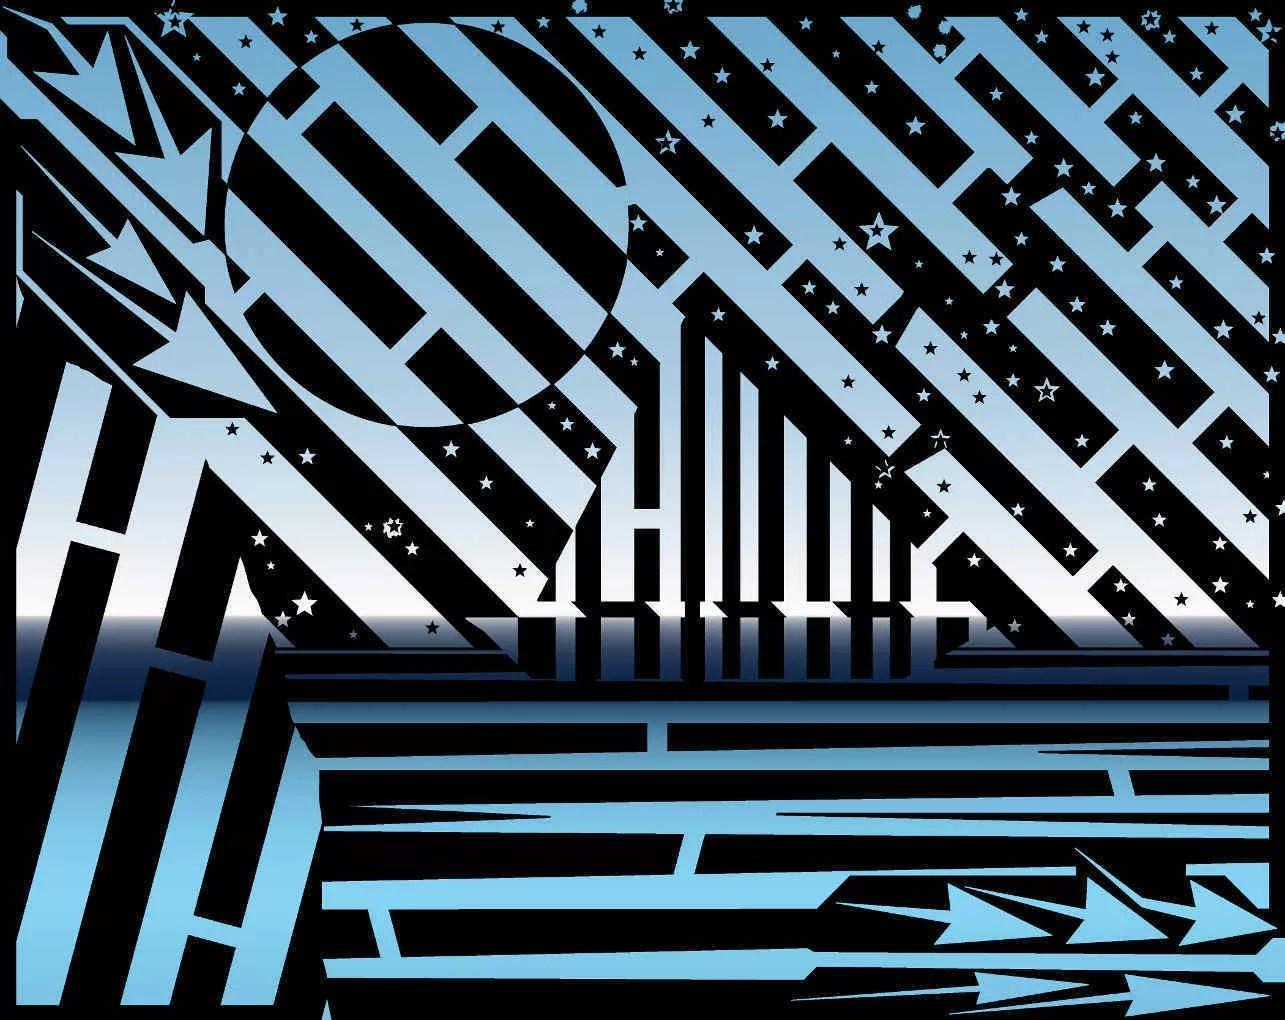 Midnight Sailing Maze Digital Drawing By Yanito Freminoshi